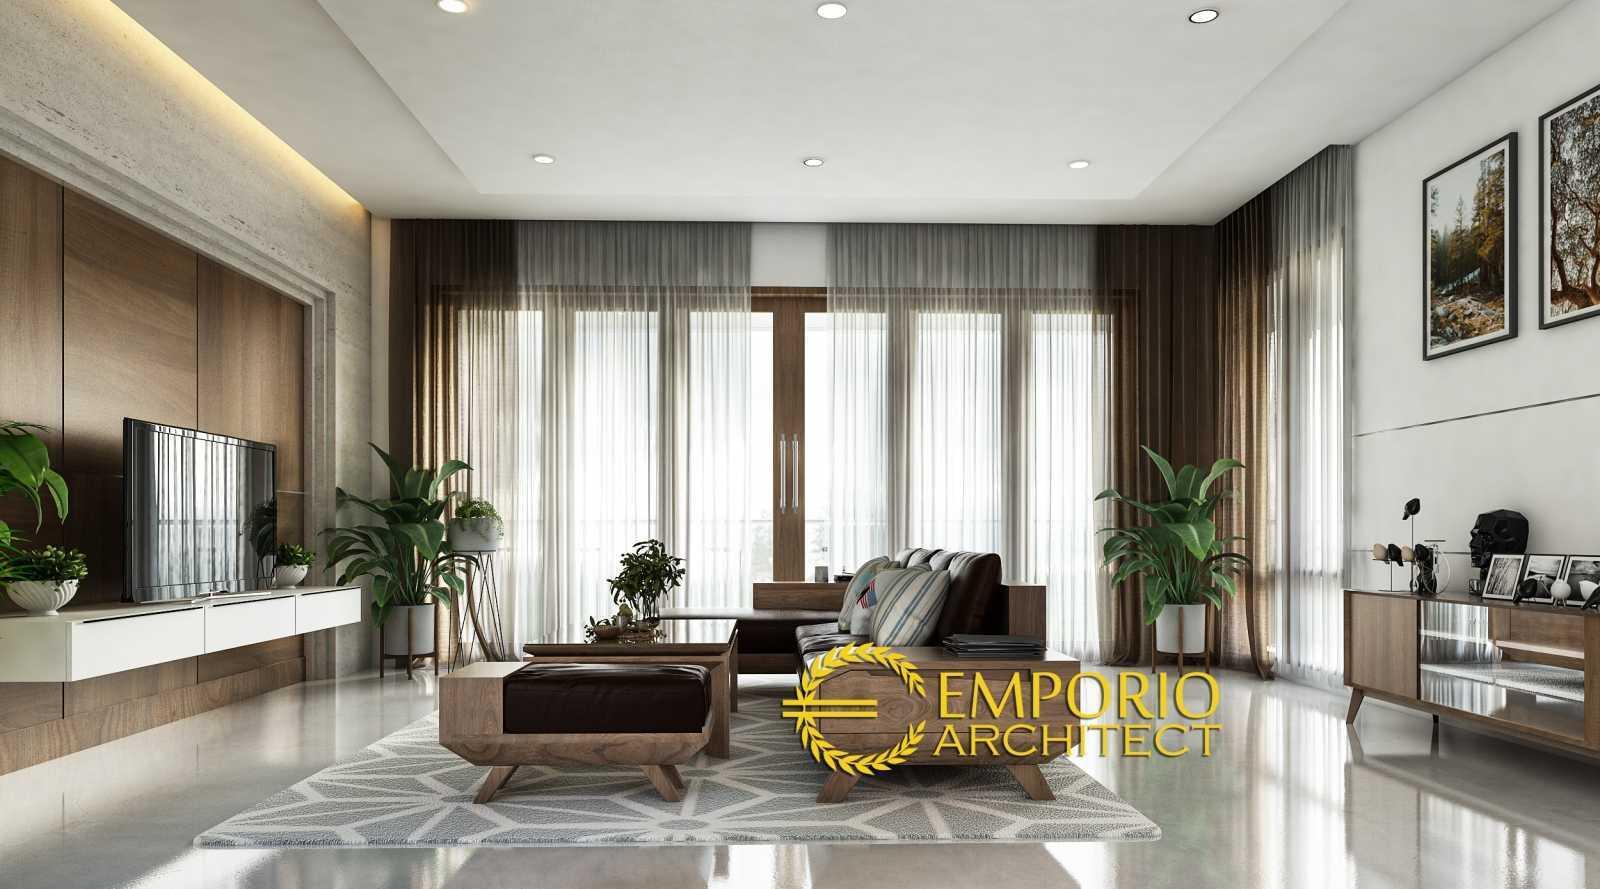 Emporio Architect Desain Rumah Modern Tropis 595 @ Mengwi, Badung, Bali Mengwi, Kec. Mengwi, Kabupaten Badung, Bali, Indonesia Mengwi, Kec. Mengwi, Kabupaten Badung, Bali, Indonesia Emporio-Architect-Desain-Rumah-Modern-Tropis-595-Mengwi-Badung-Bali  76607